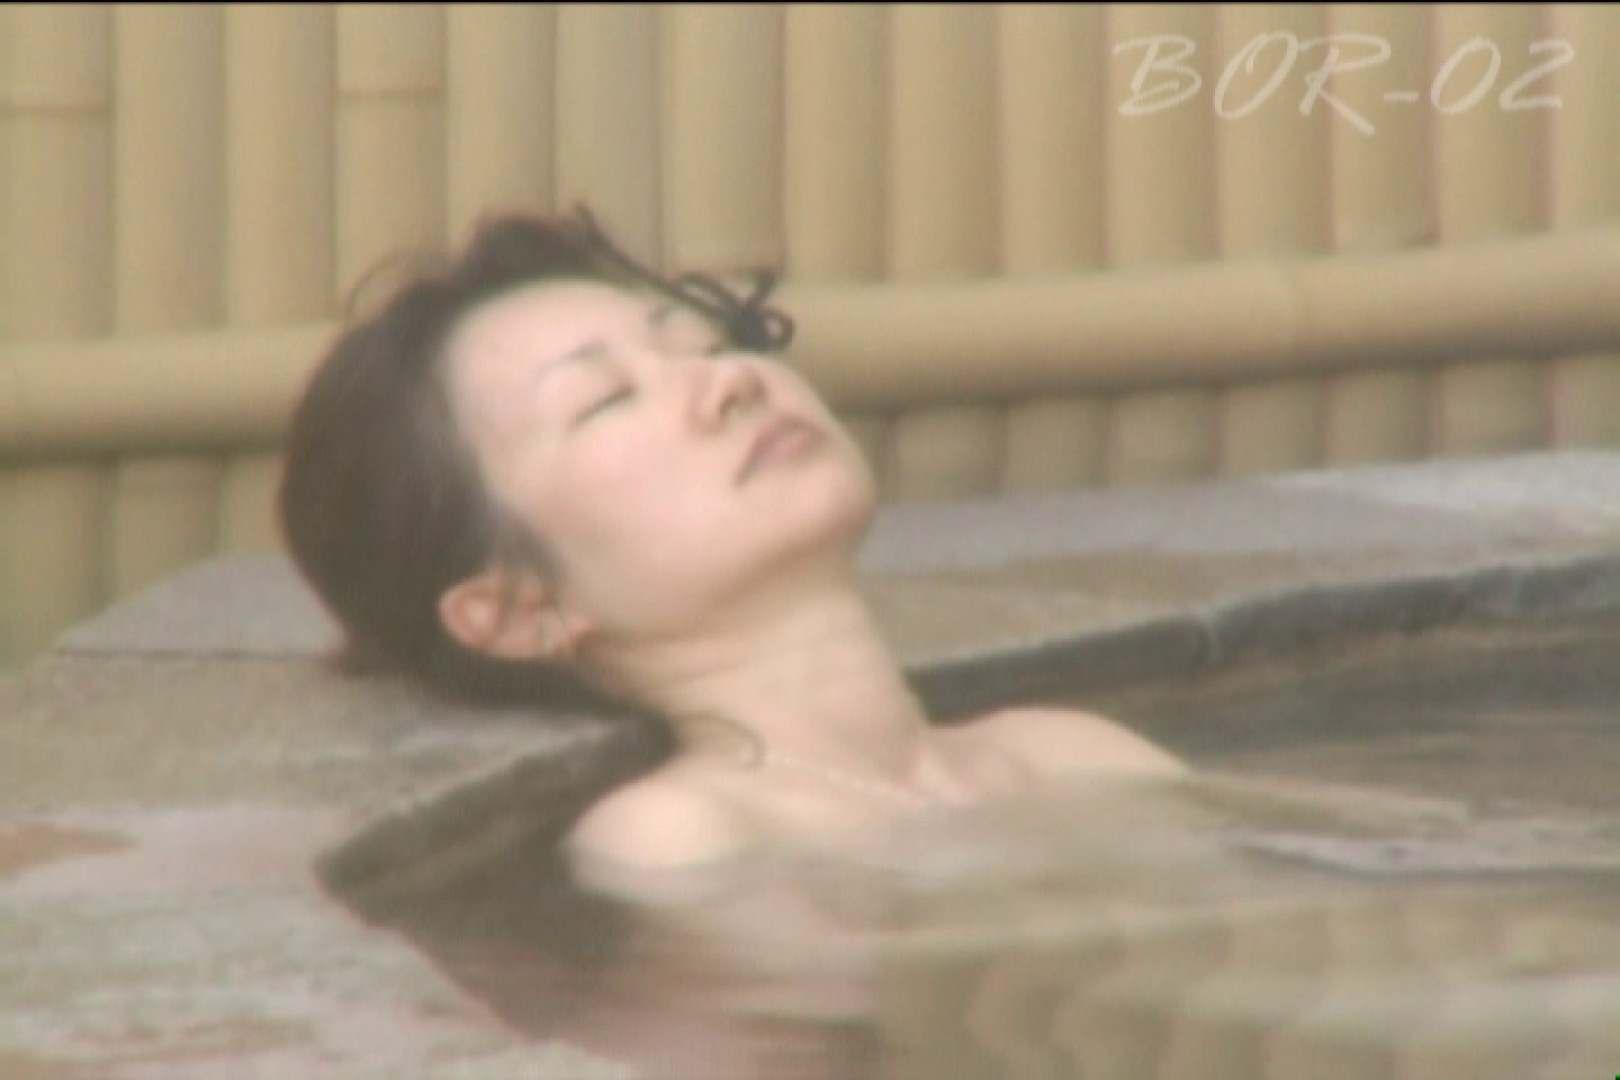 Aquaな露天風呂Vol.477 盗撮シリーズ | 露天風呂編  104PIX 65